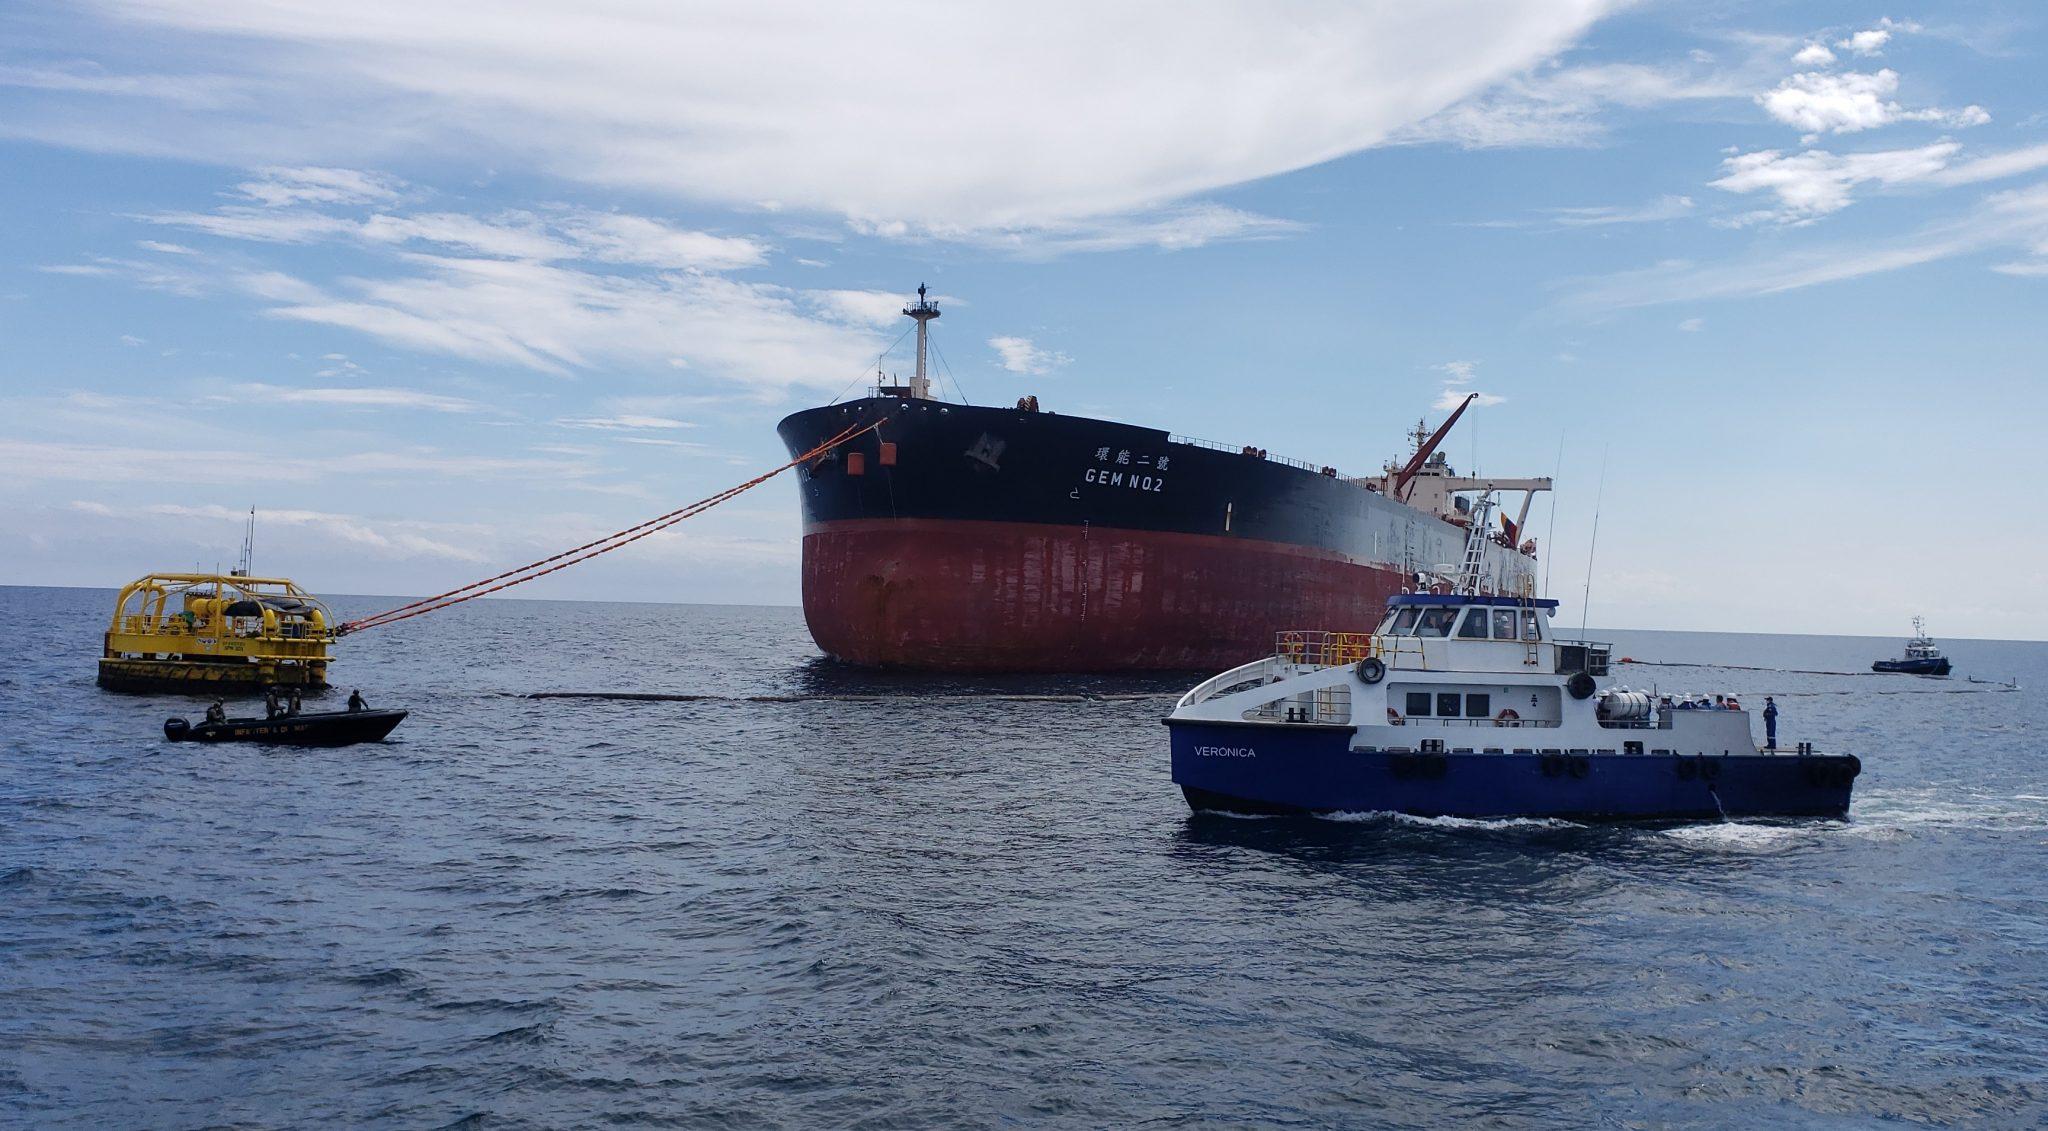 Ecuador exportó por primera vez crudo oriente en buque de alto calado, a través del terminal marítimo de ocp.